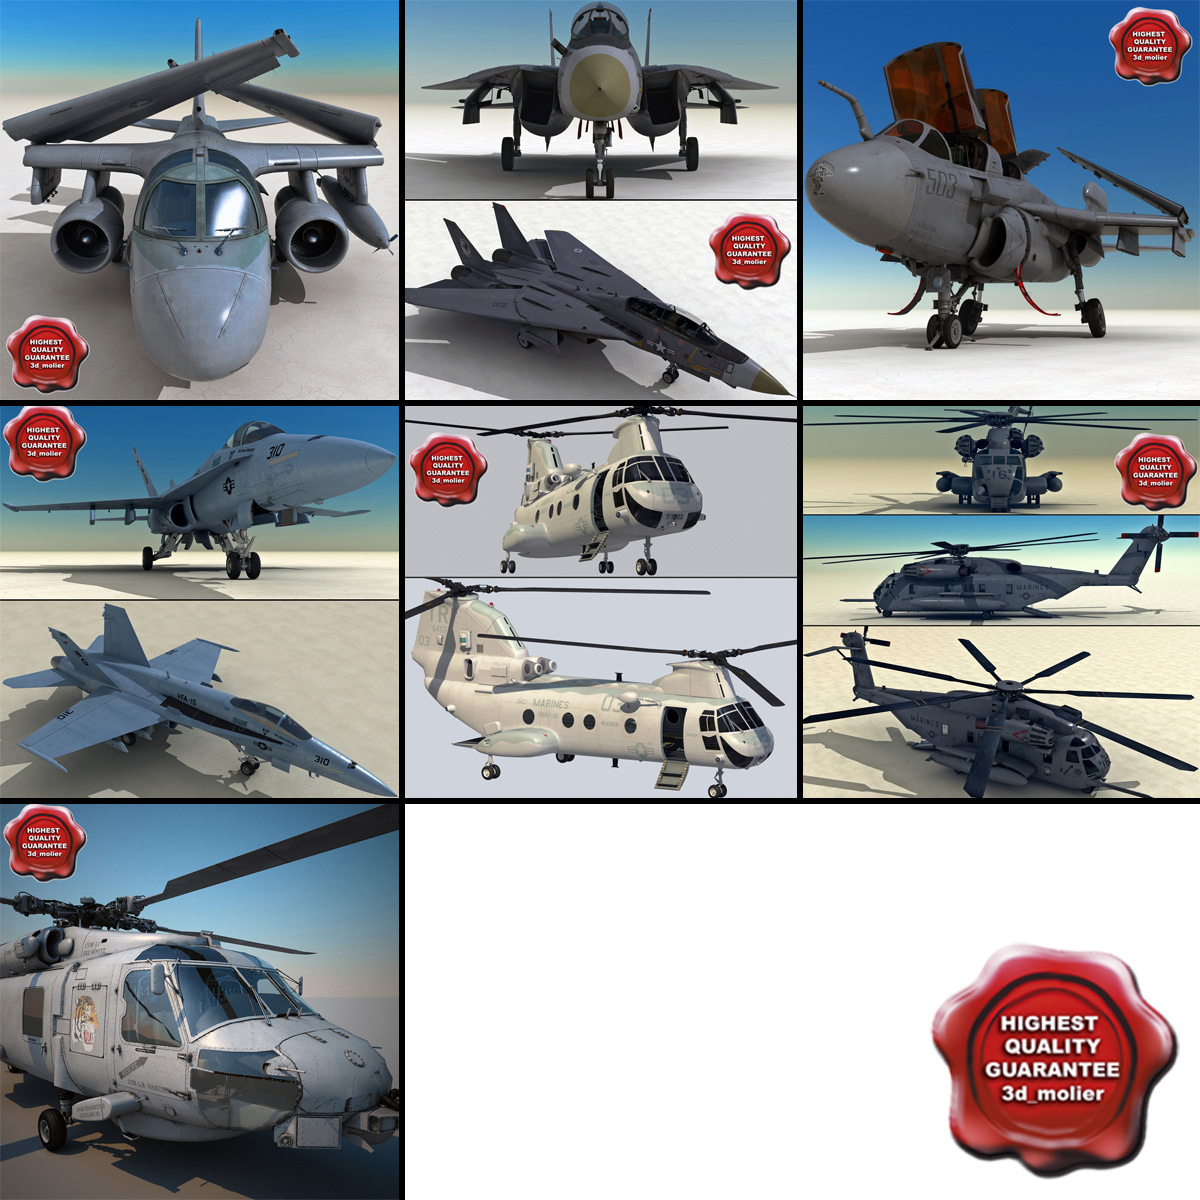 US_Navy_Aircraft_Collection_V1_000.jpg